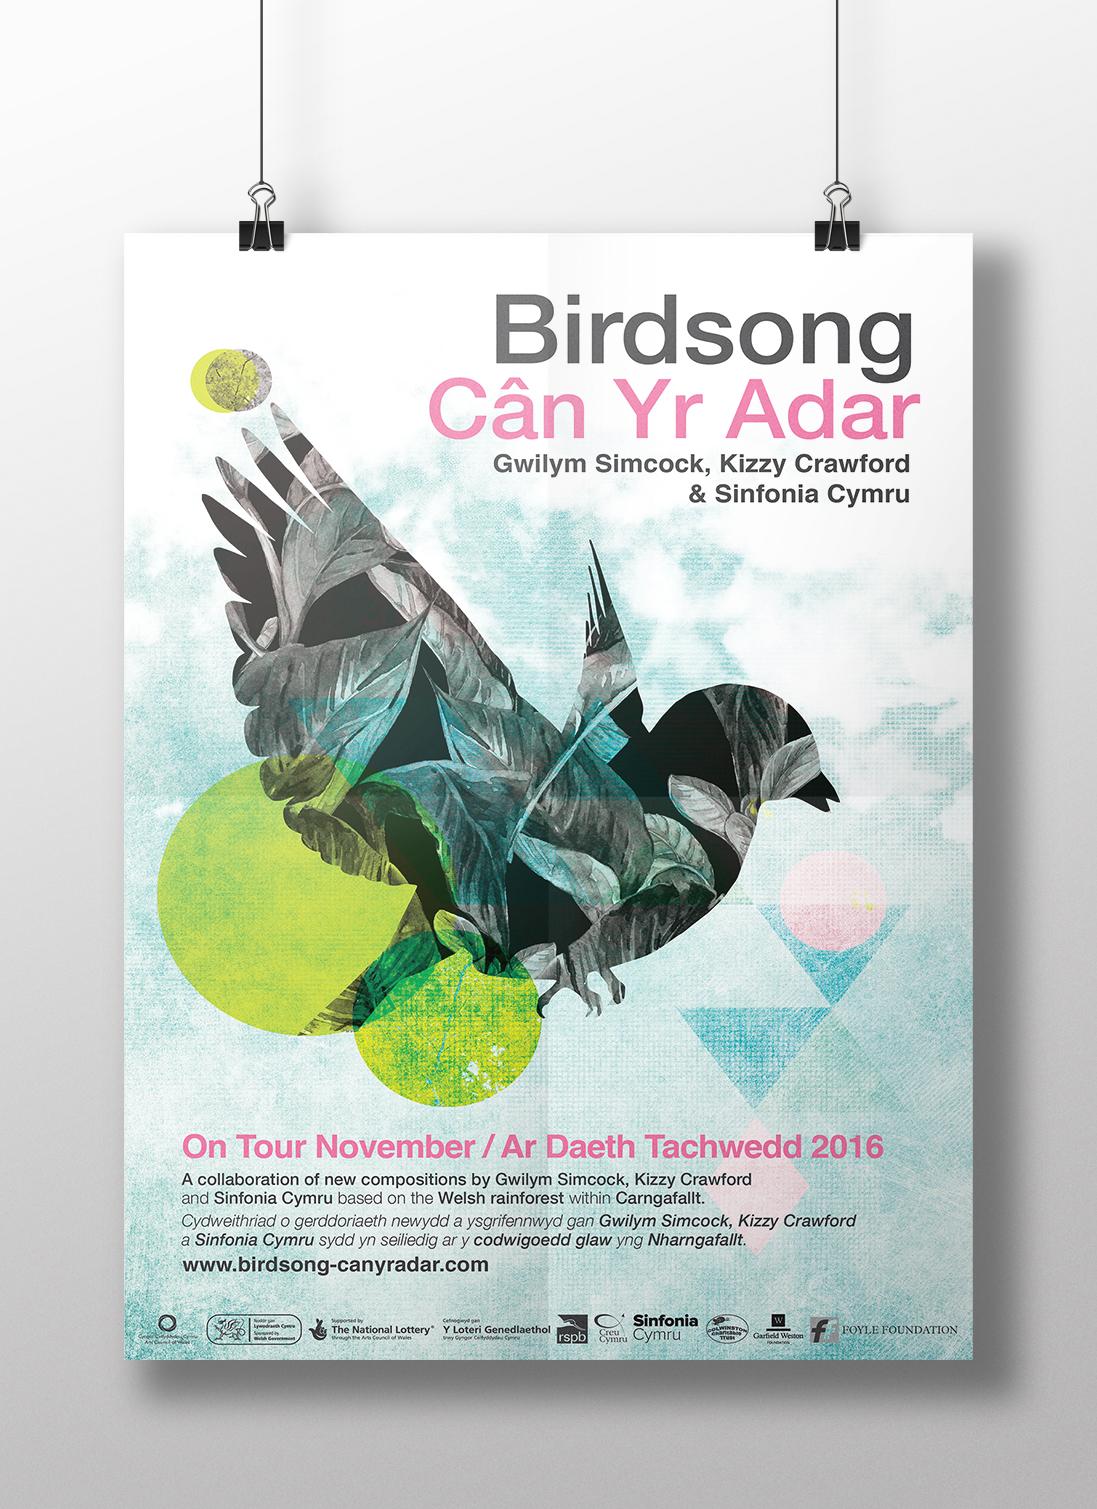 Birdsong poster_mockup_MD.jpg